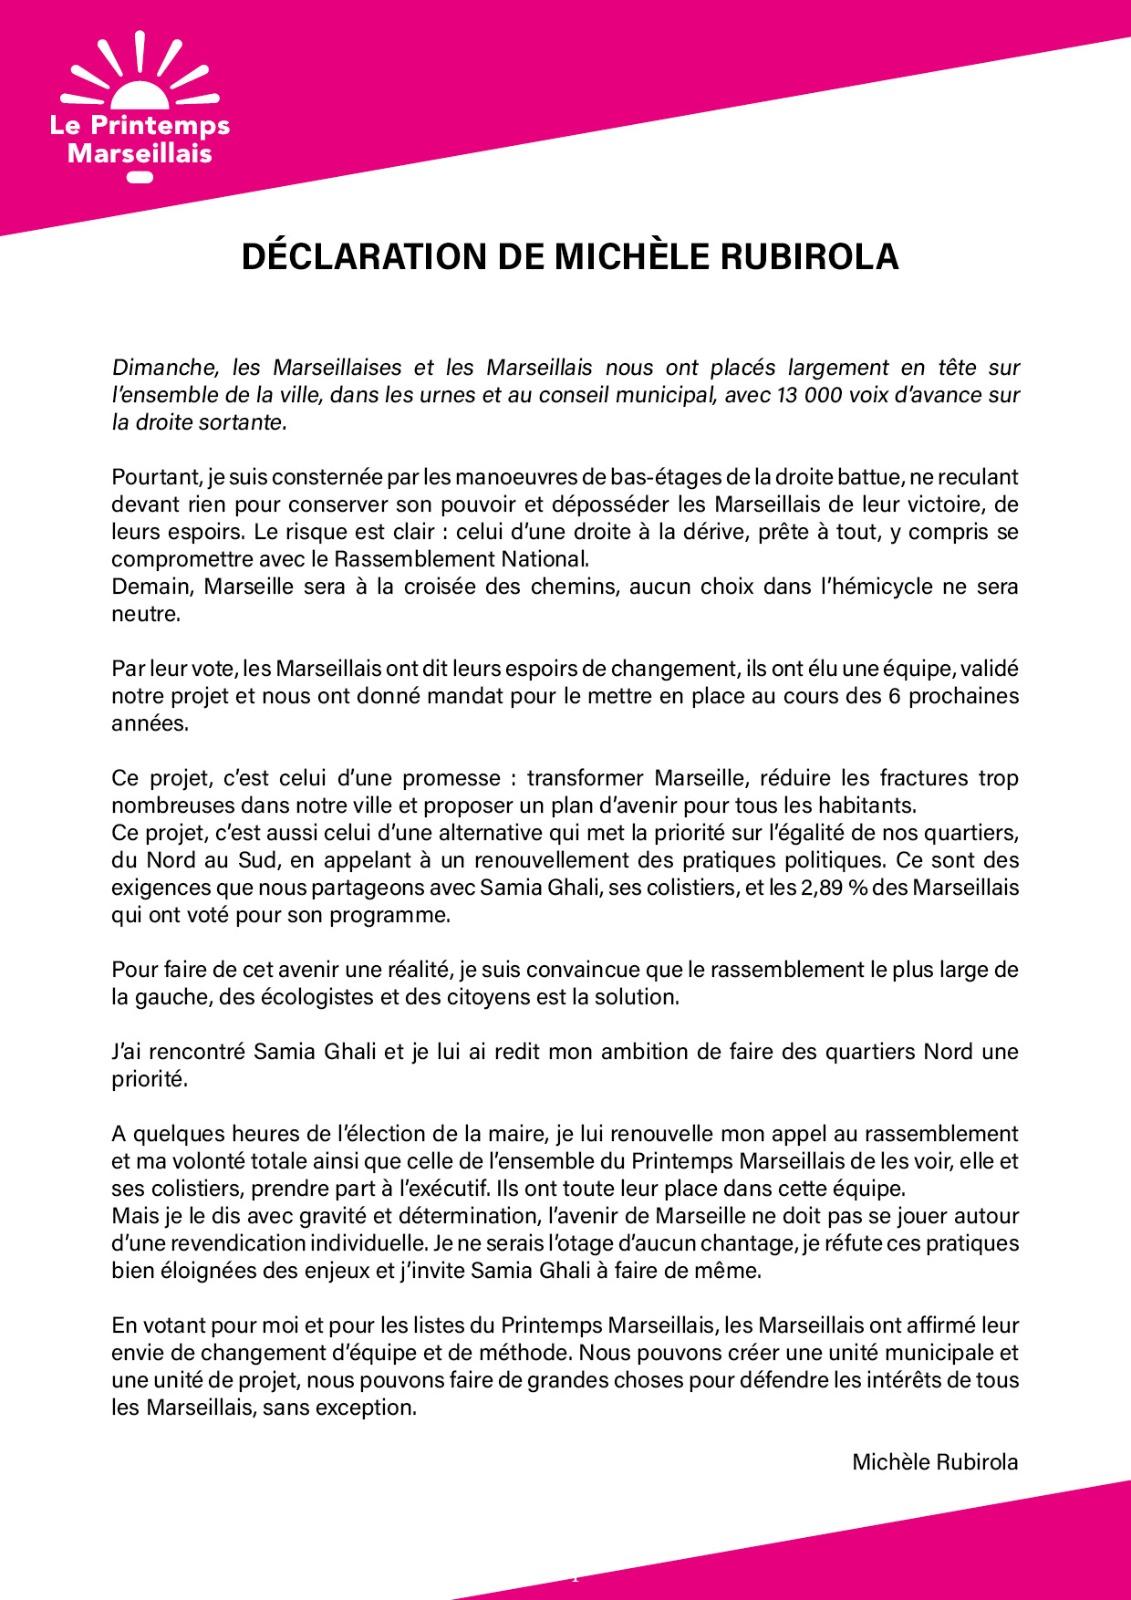 Déclaration de Michèle Rubirola à Samia Ghali